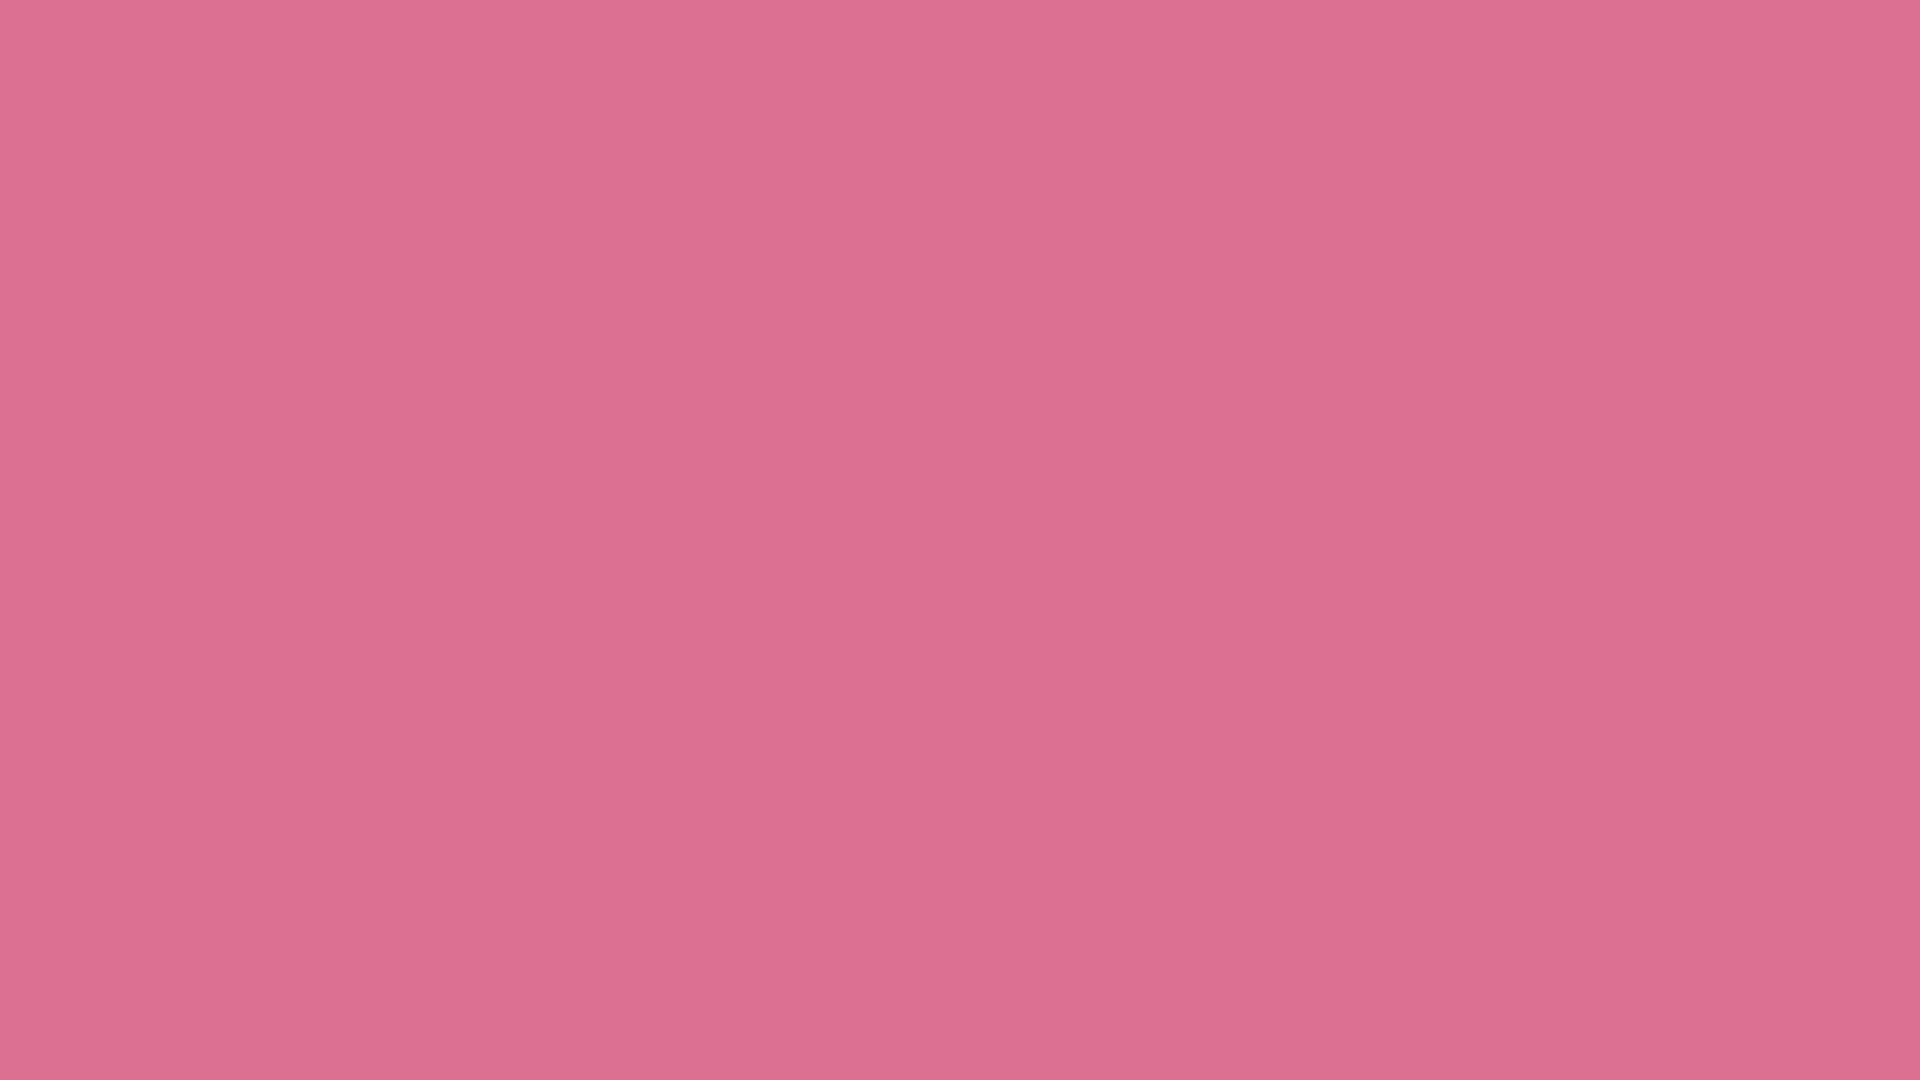 1920x1080 Pale Violet-red Solid Color Background